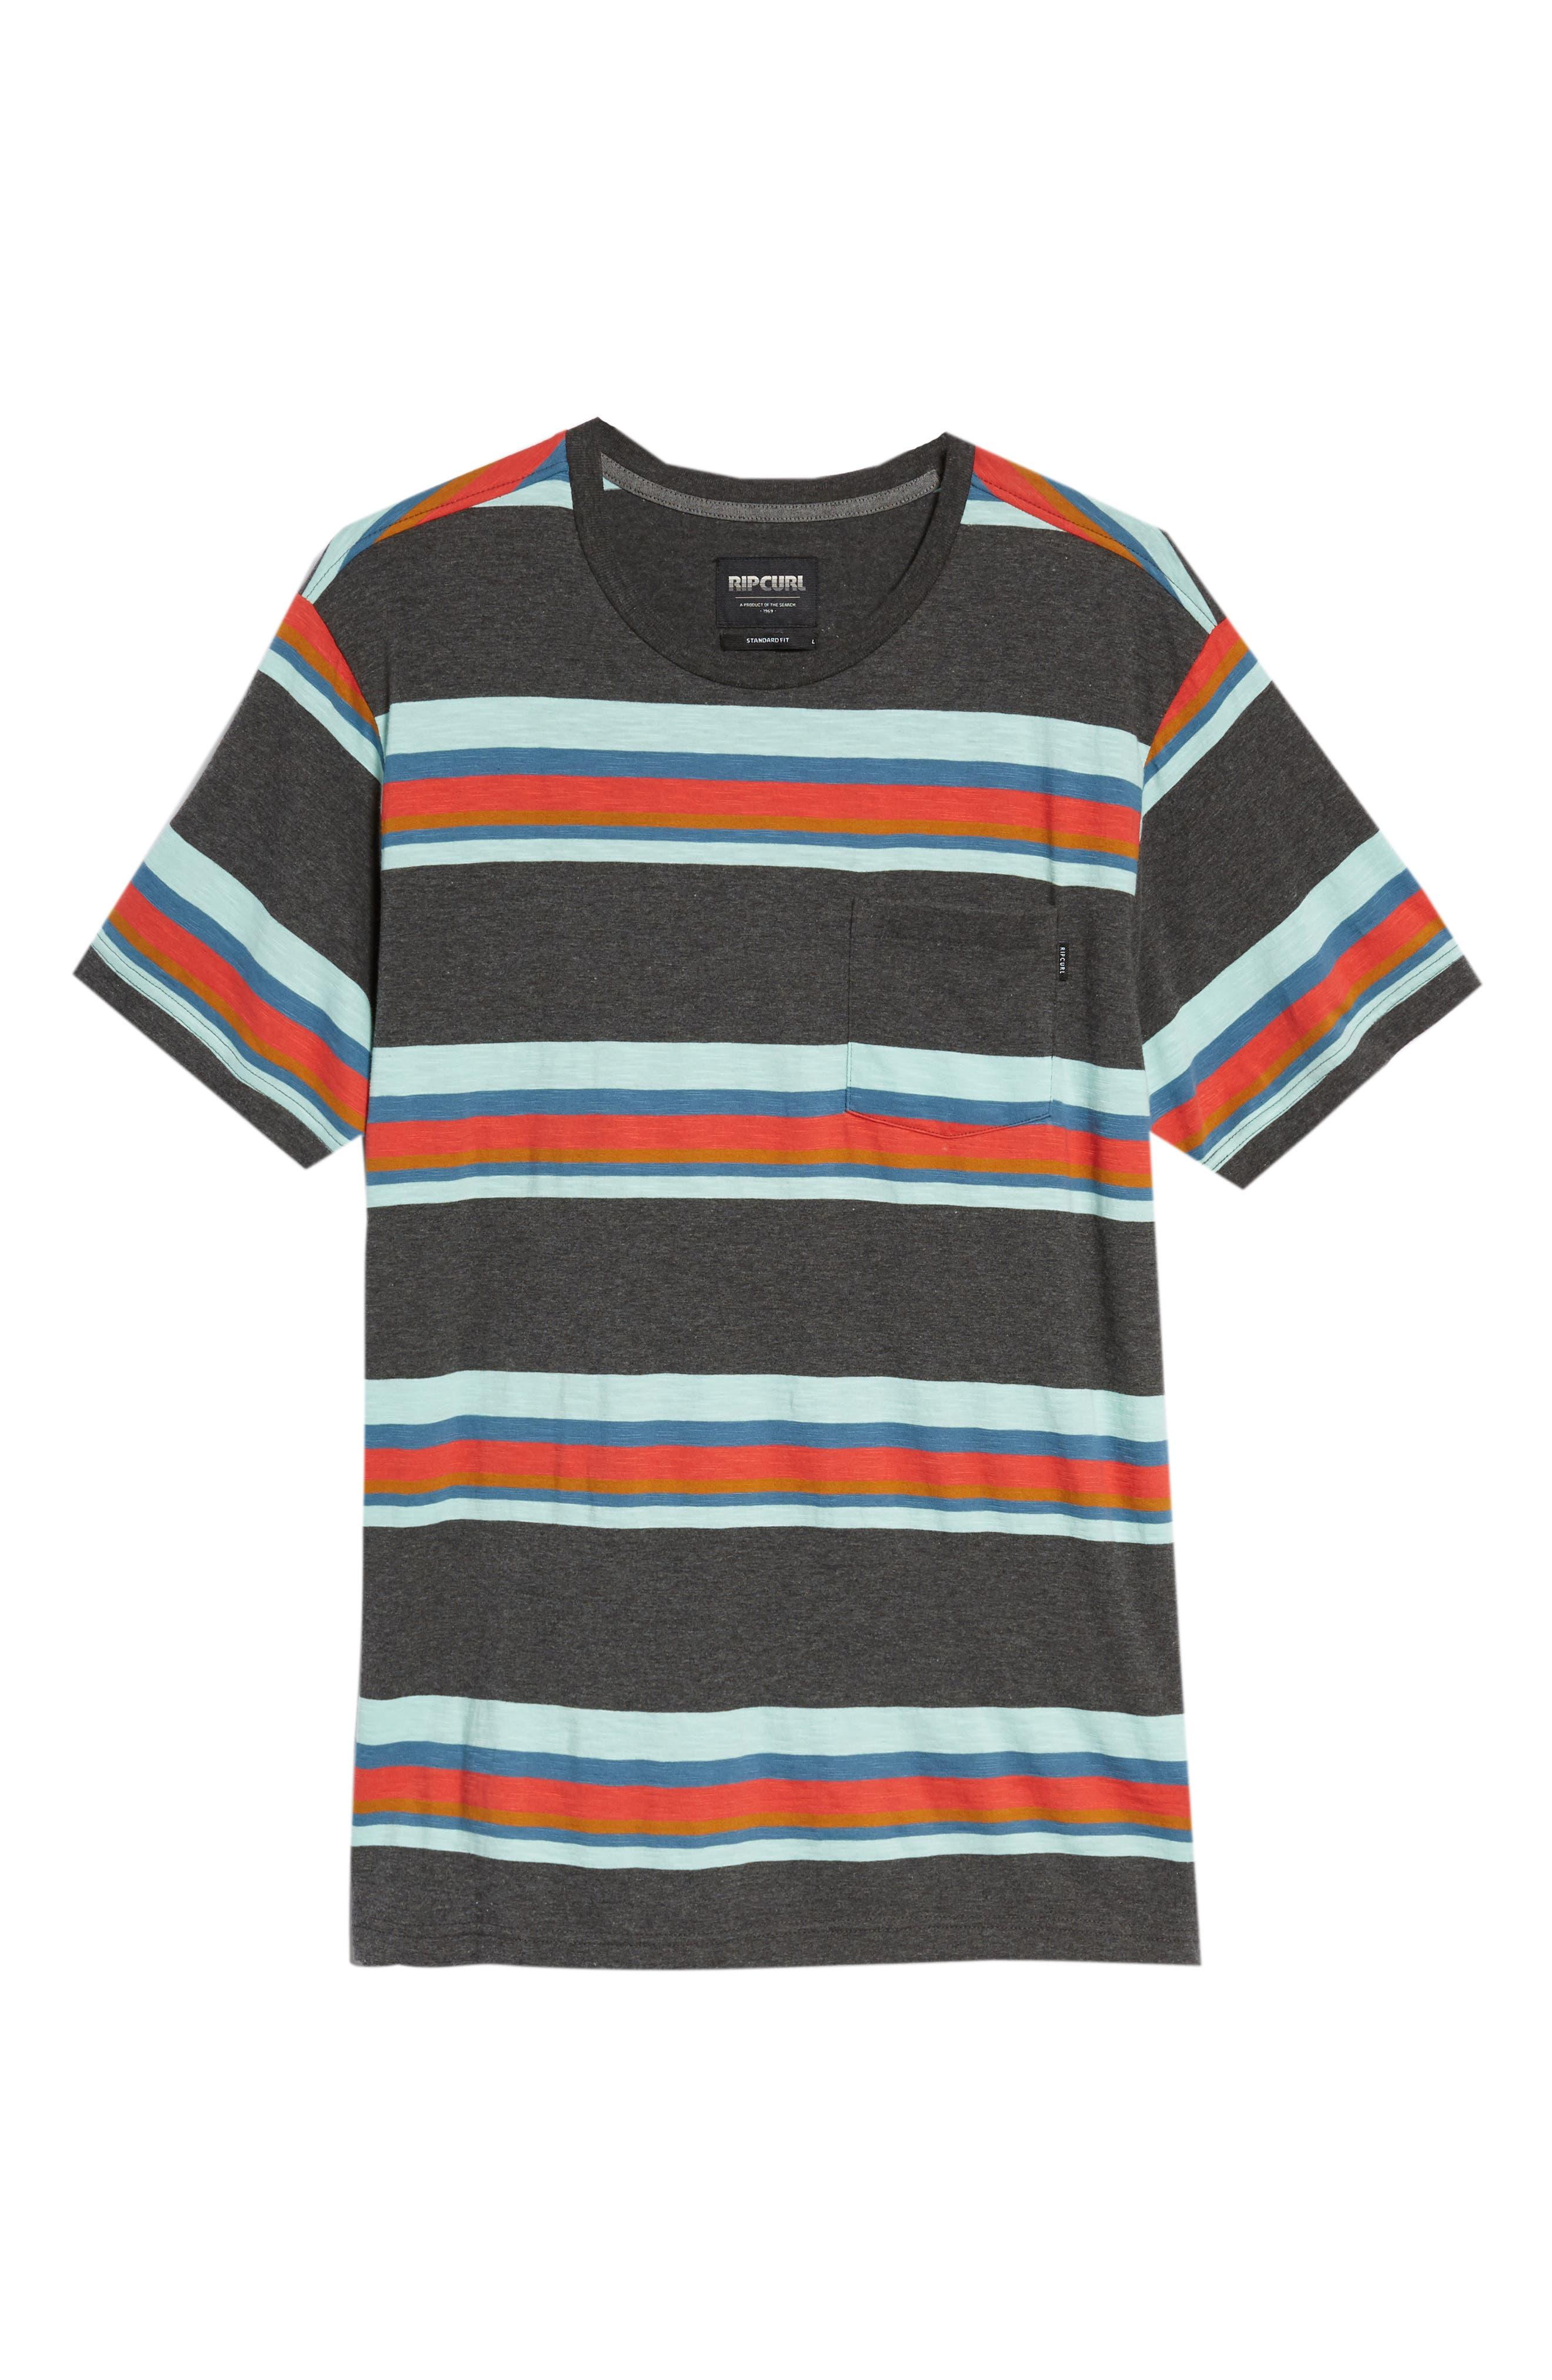 Prospect T-Shirt,                             Alternate thumbnail 6, color,                             020